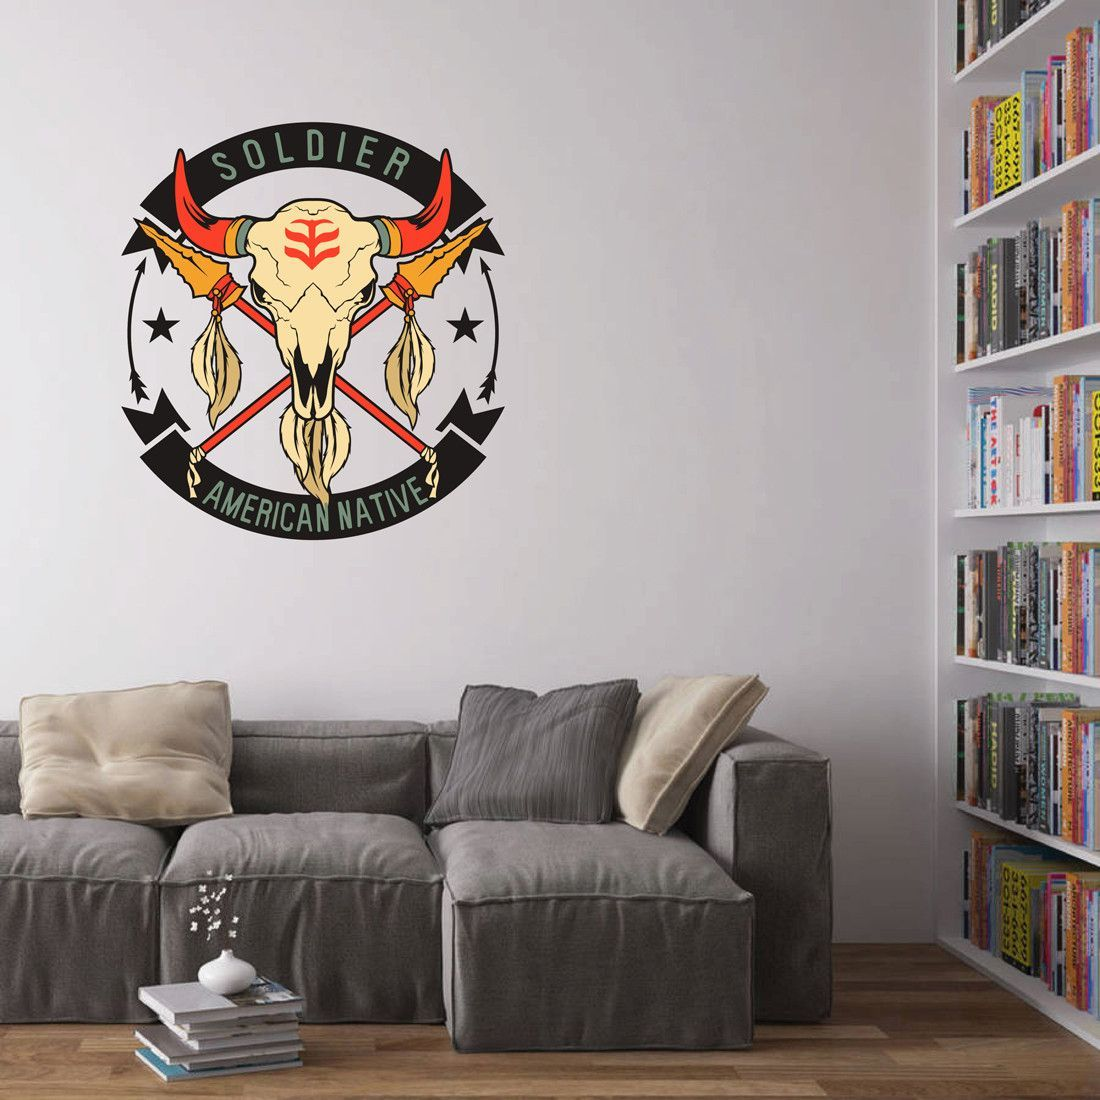 cik439 Full Color Wall decal American culture symbol skull bison buffalo living